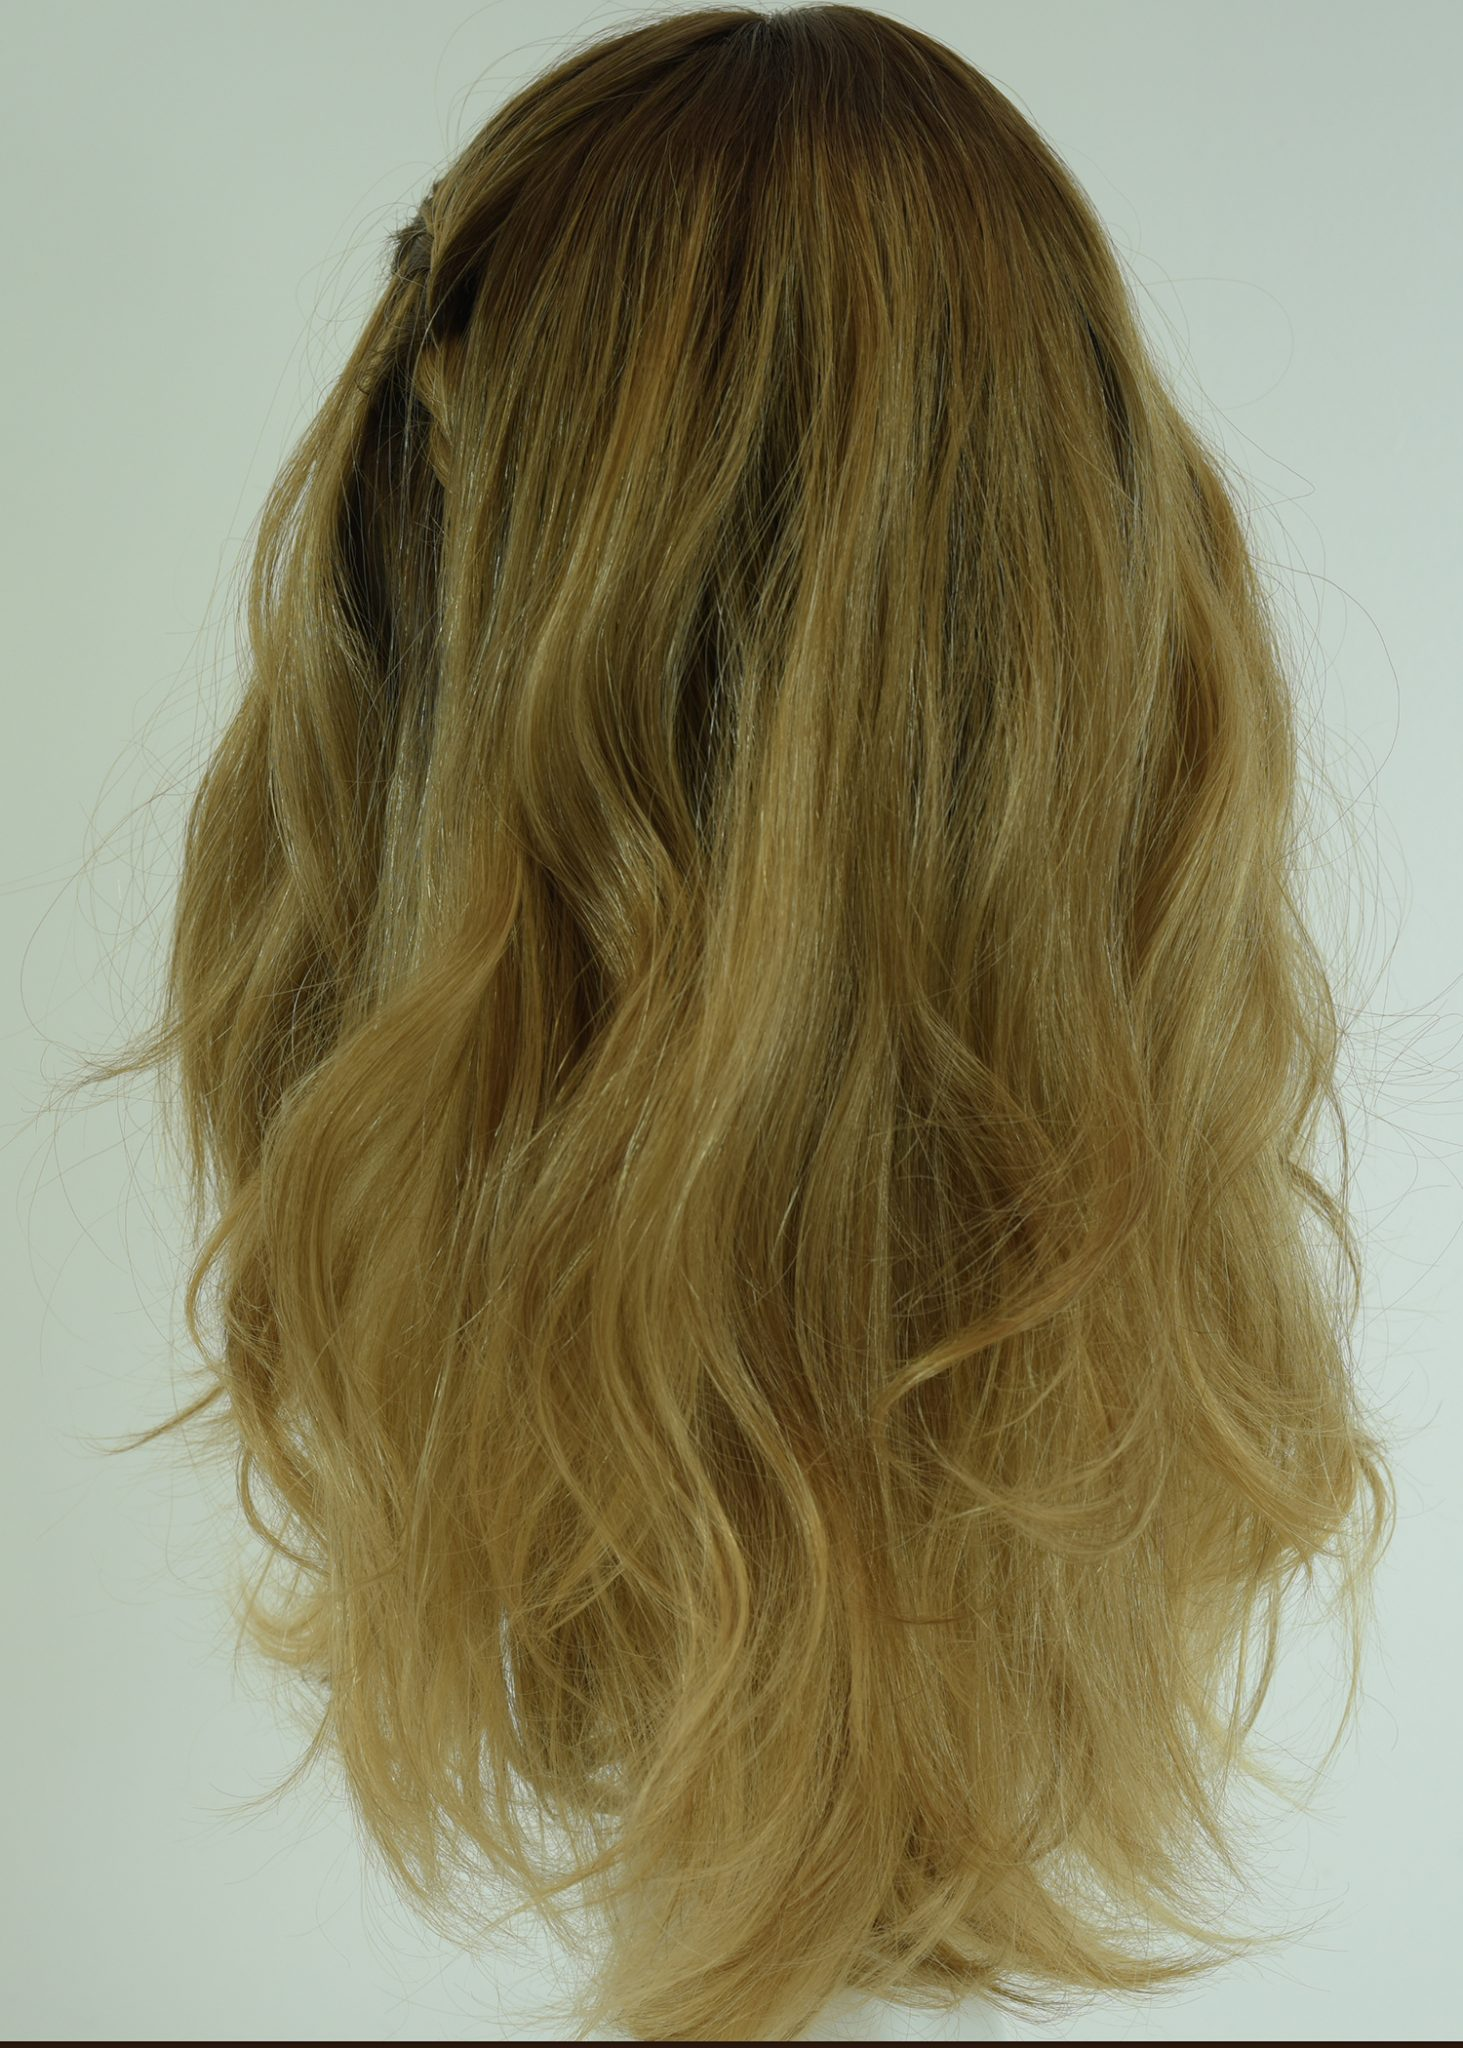 hombre, wig , sheitel, european remy virgin hair. remy processed hair